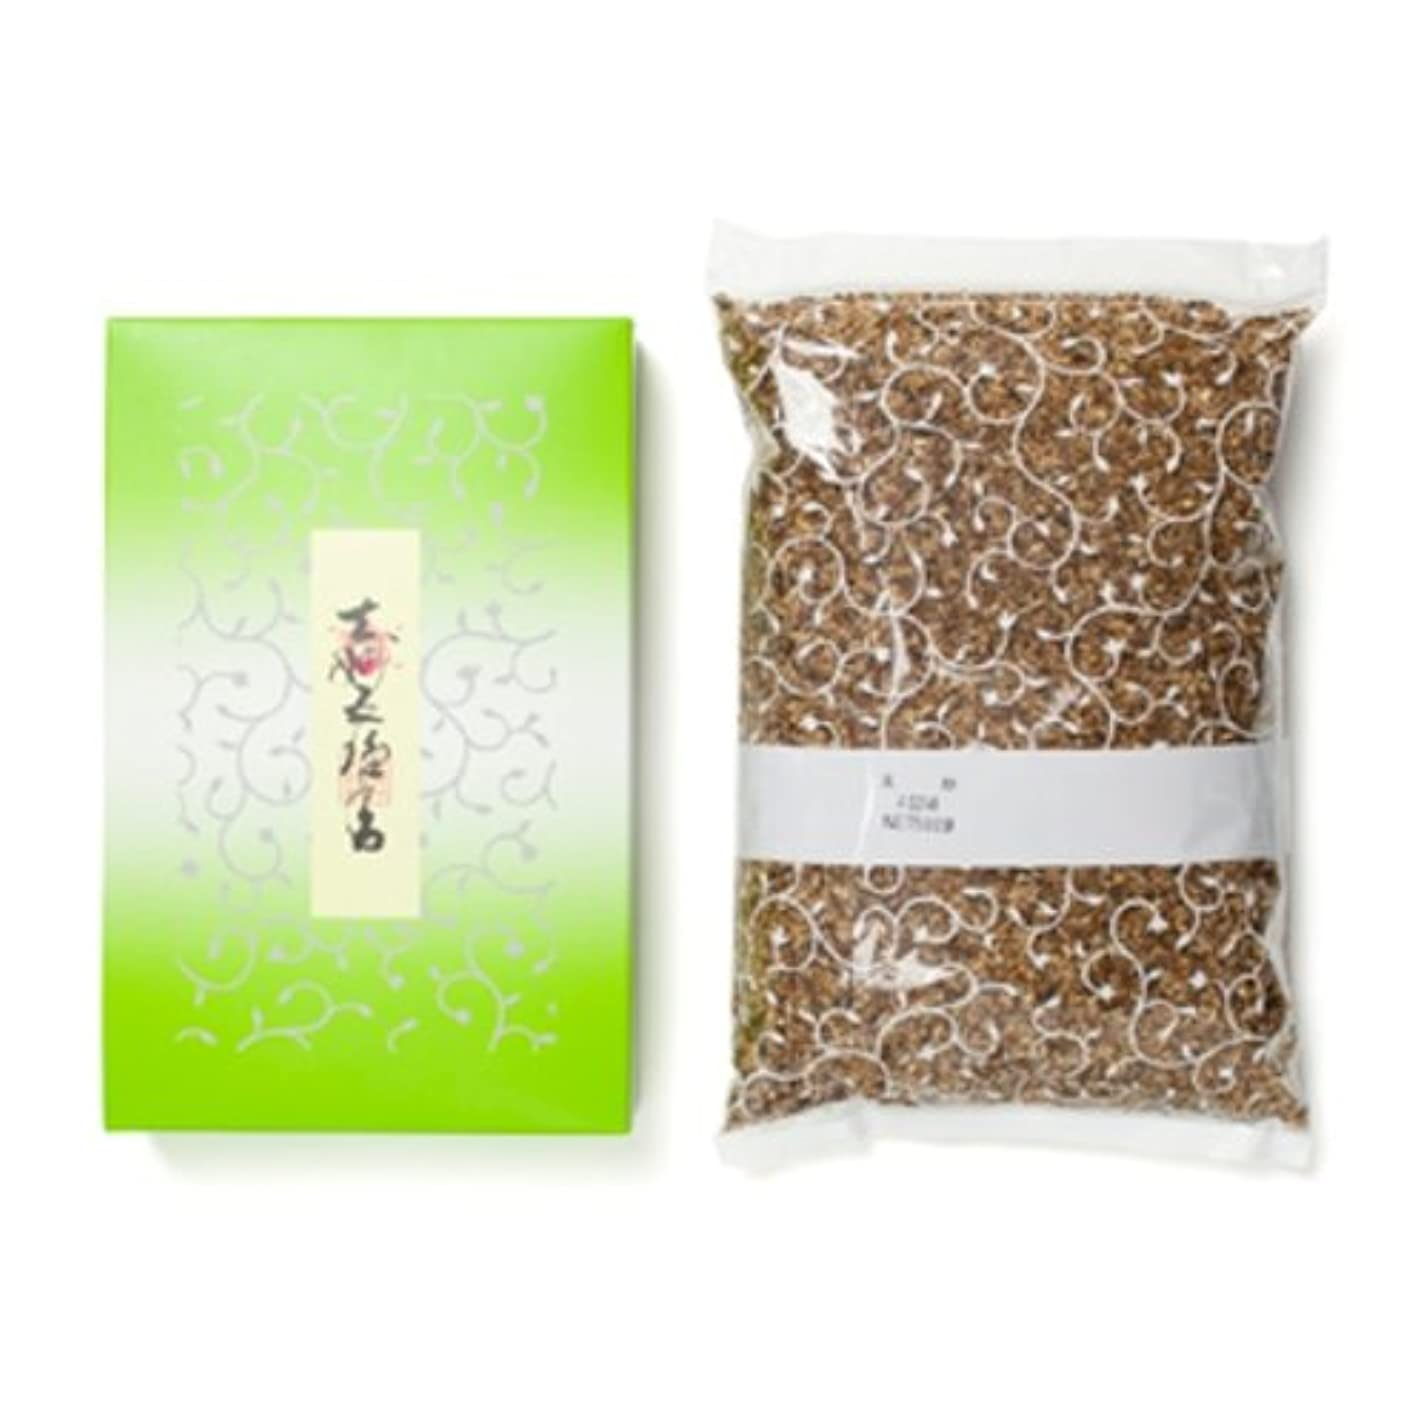 松栄堂のお焼香 玄妙五種香 500g詰 紙箱入 #410111